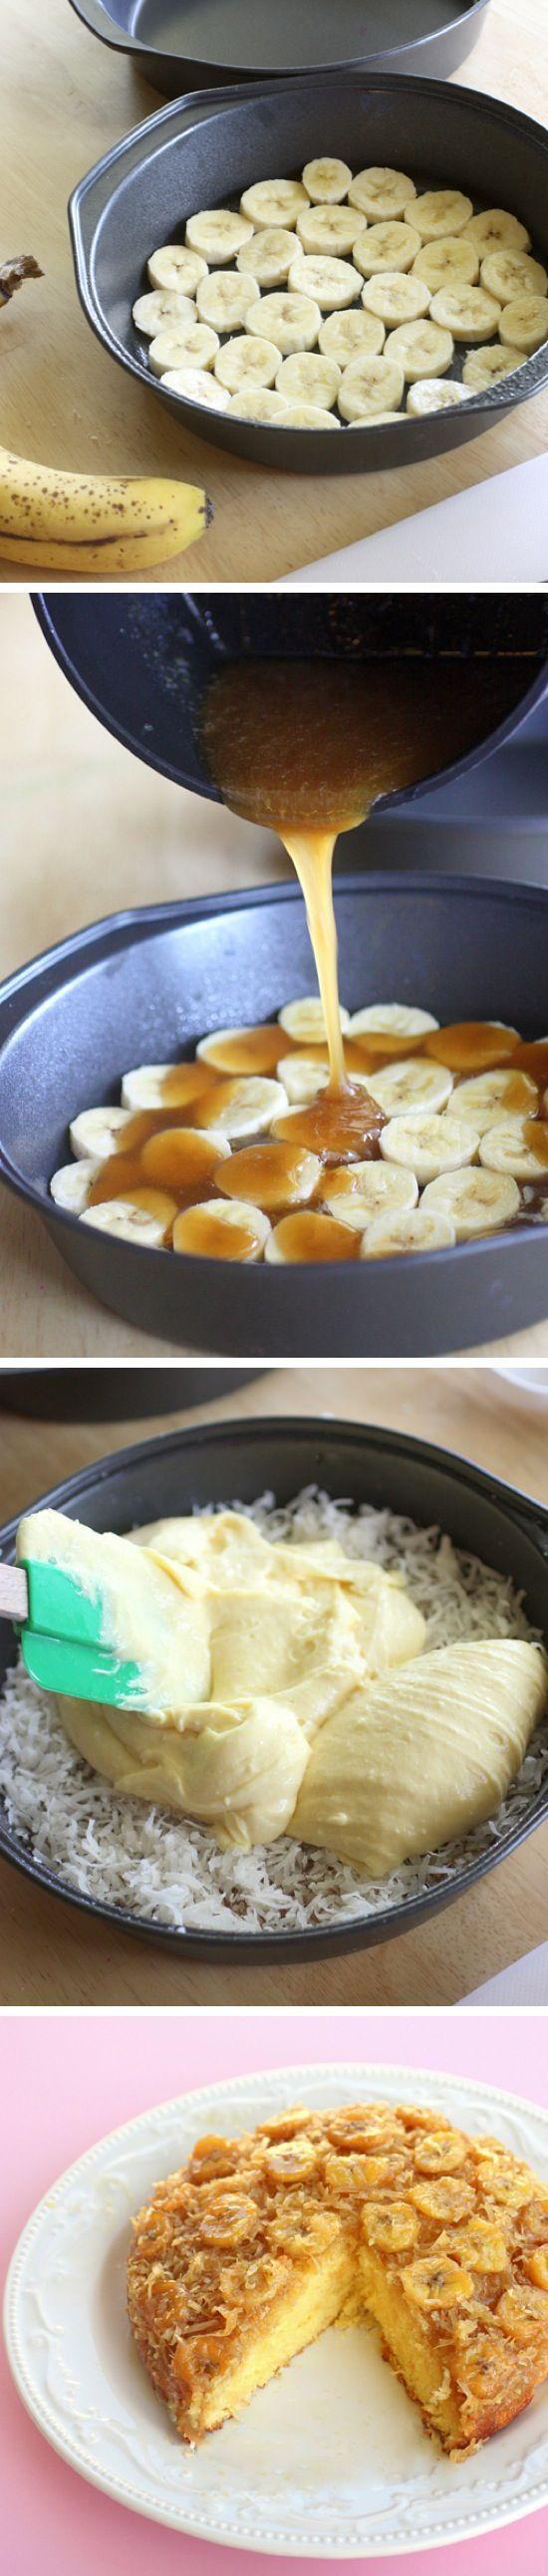 Banana Coconut Upside Down Cake | CookJino